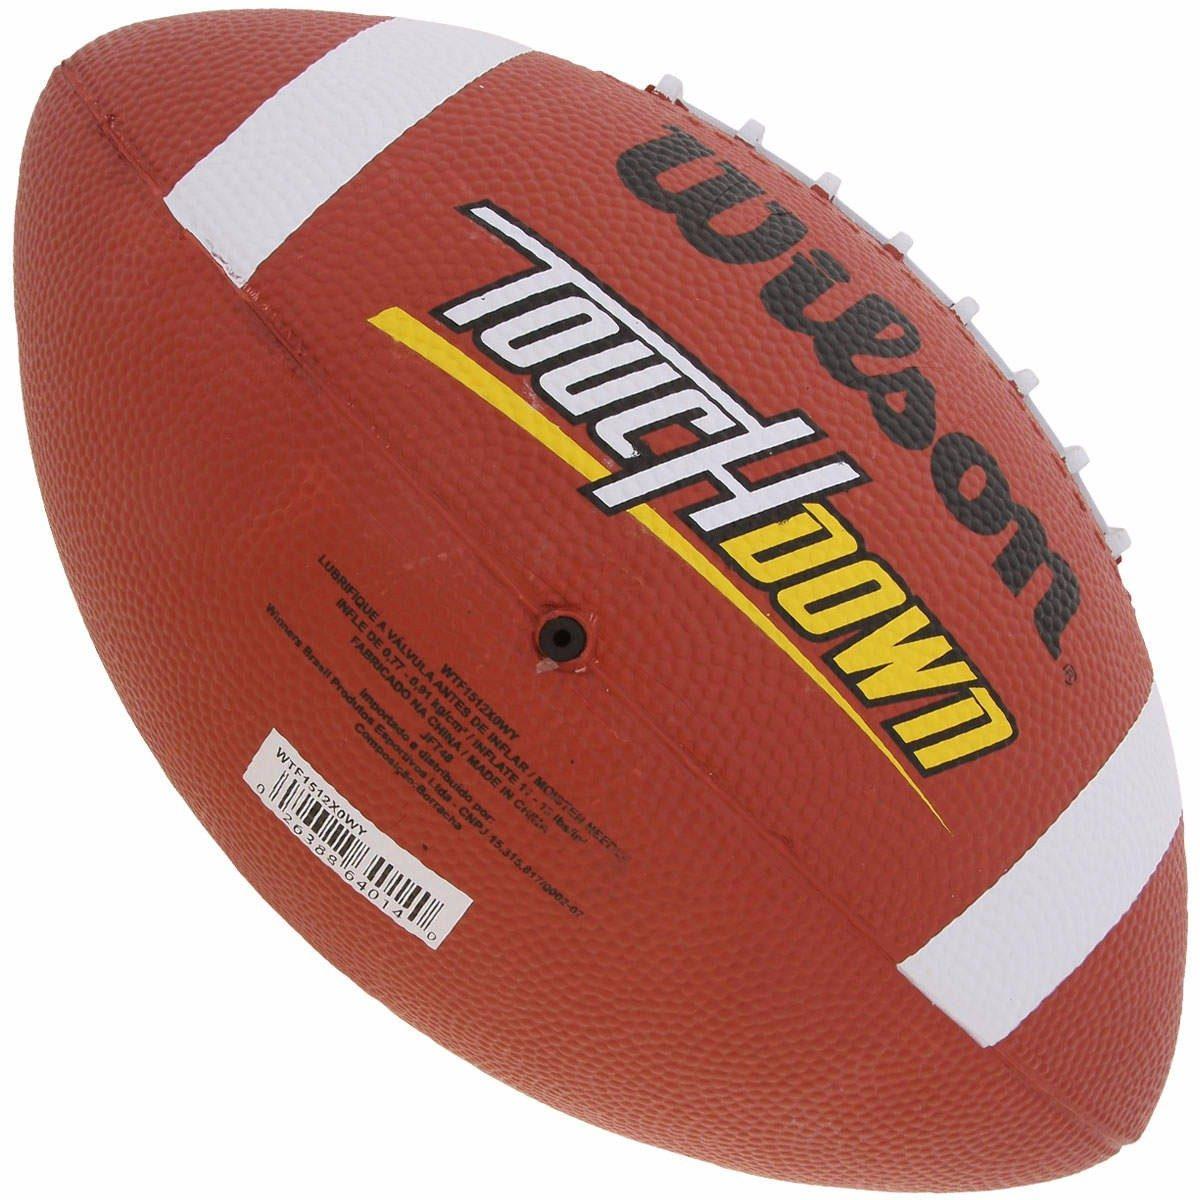 Bola De Futebol Americano Touchdown Wilson - R  55 523a12f9557f0